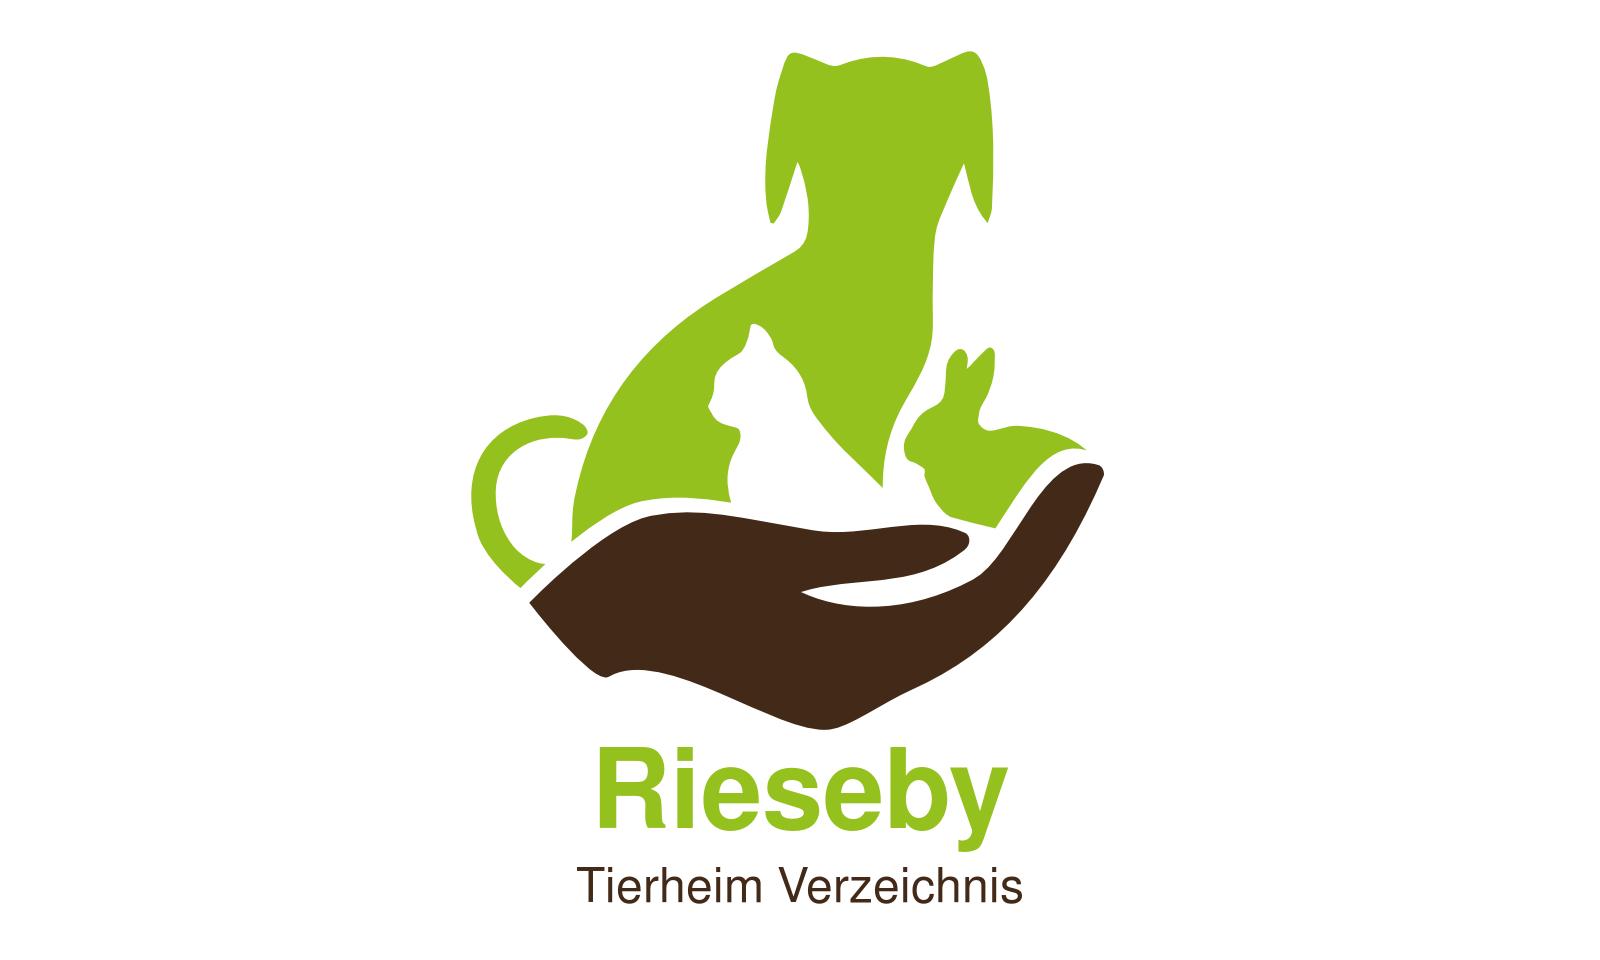 Tierheim Rieseby